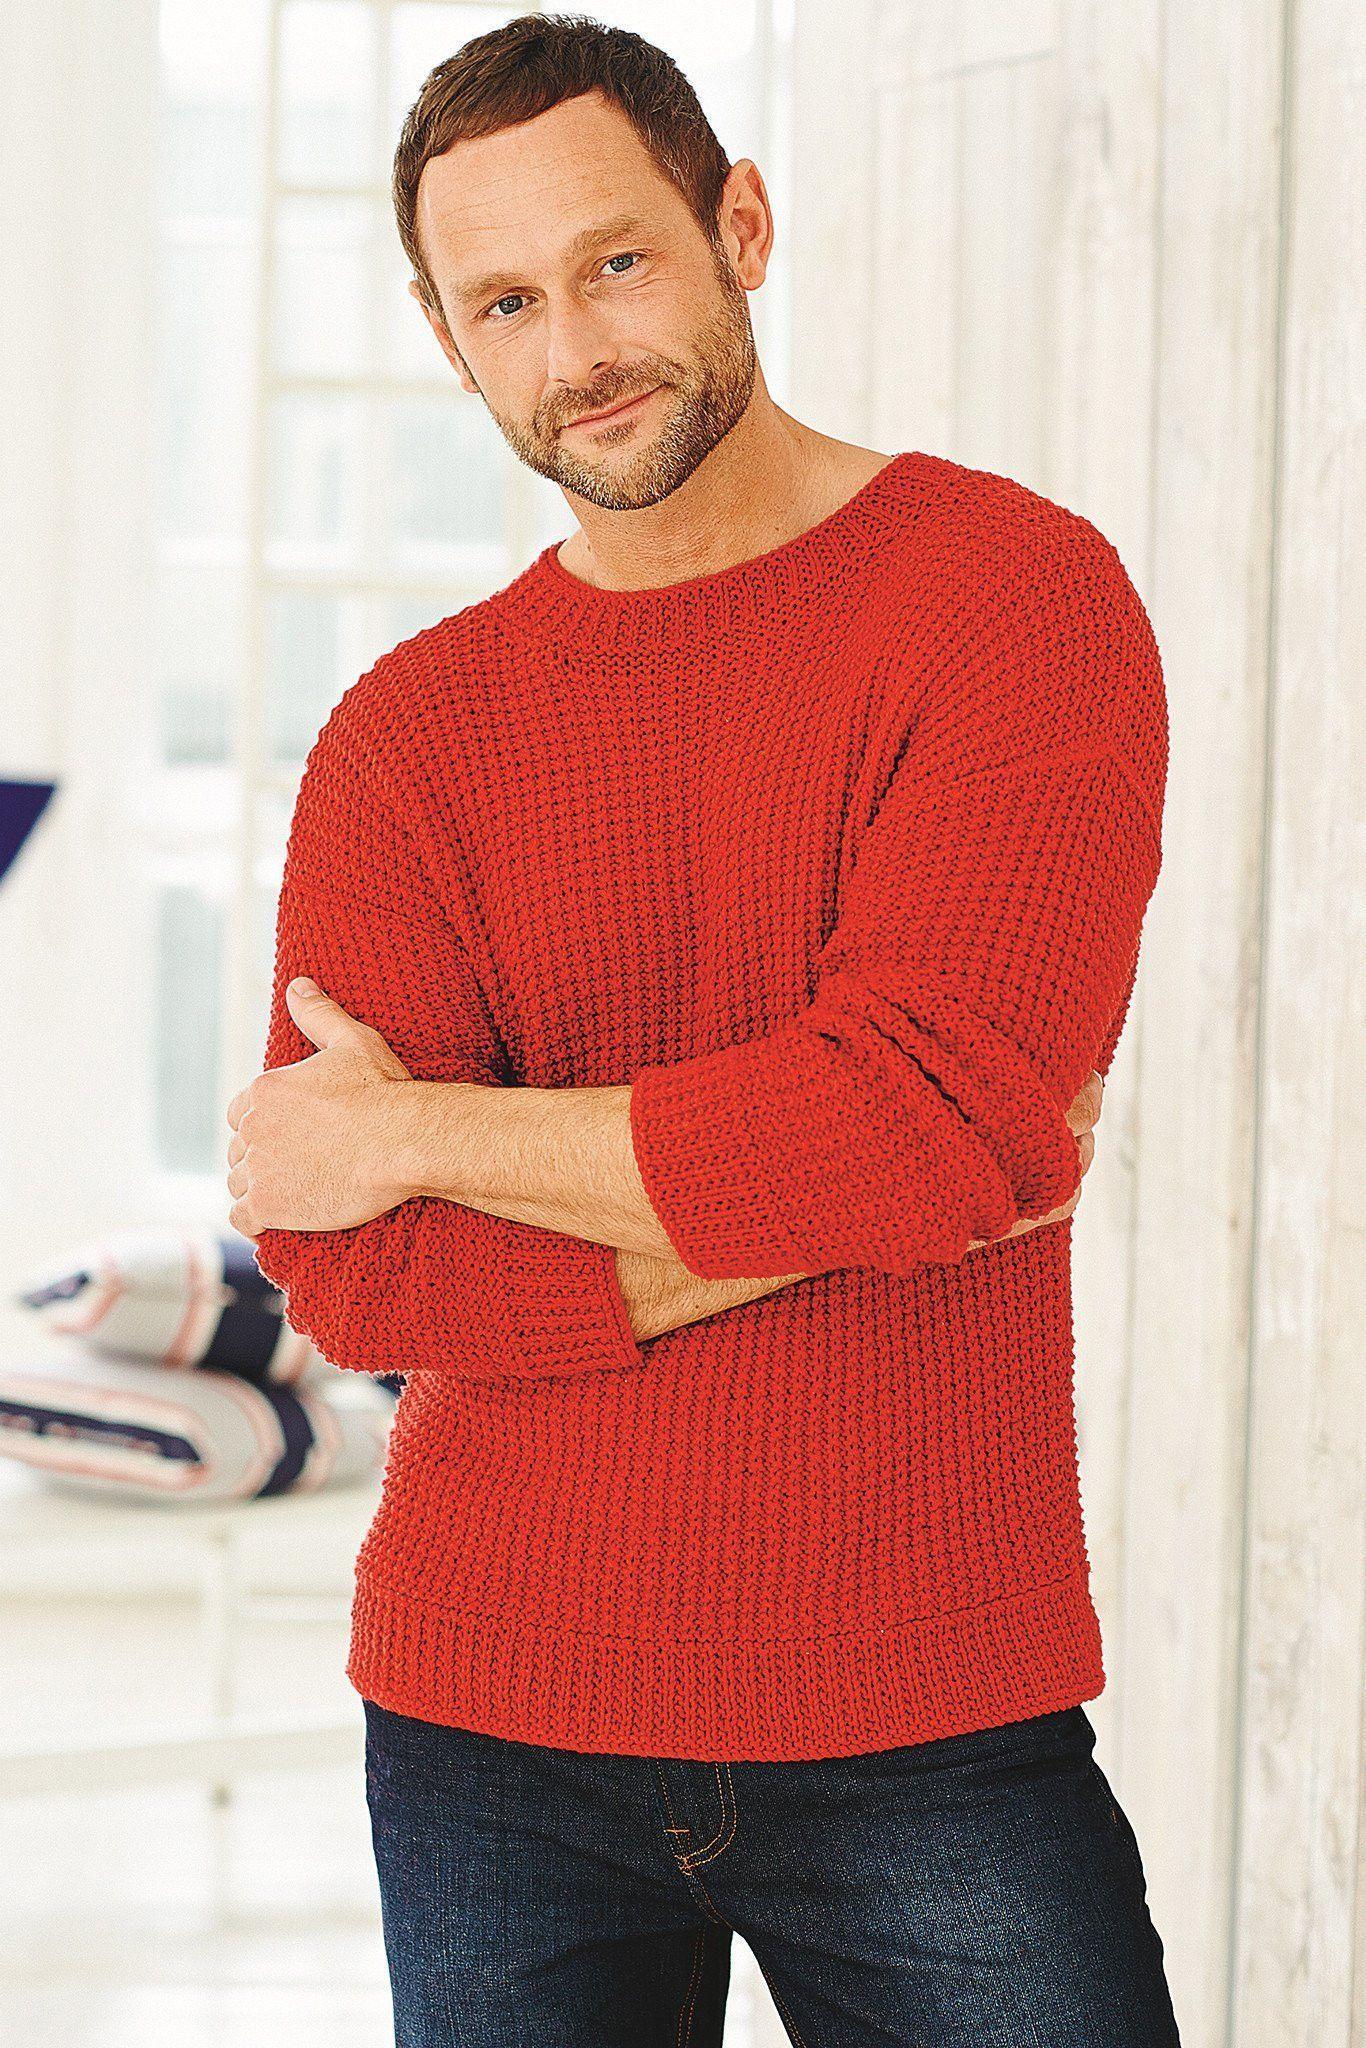 Mens Ridged Jumper Knitting Pattern   The Knitting Network